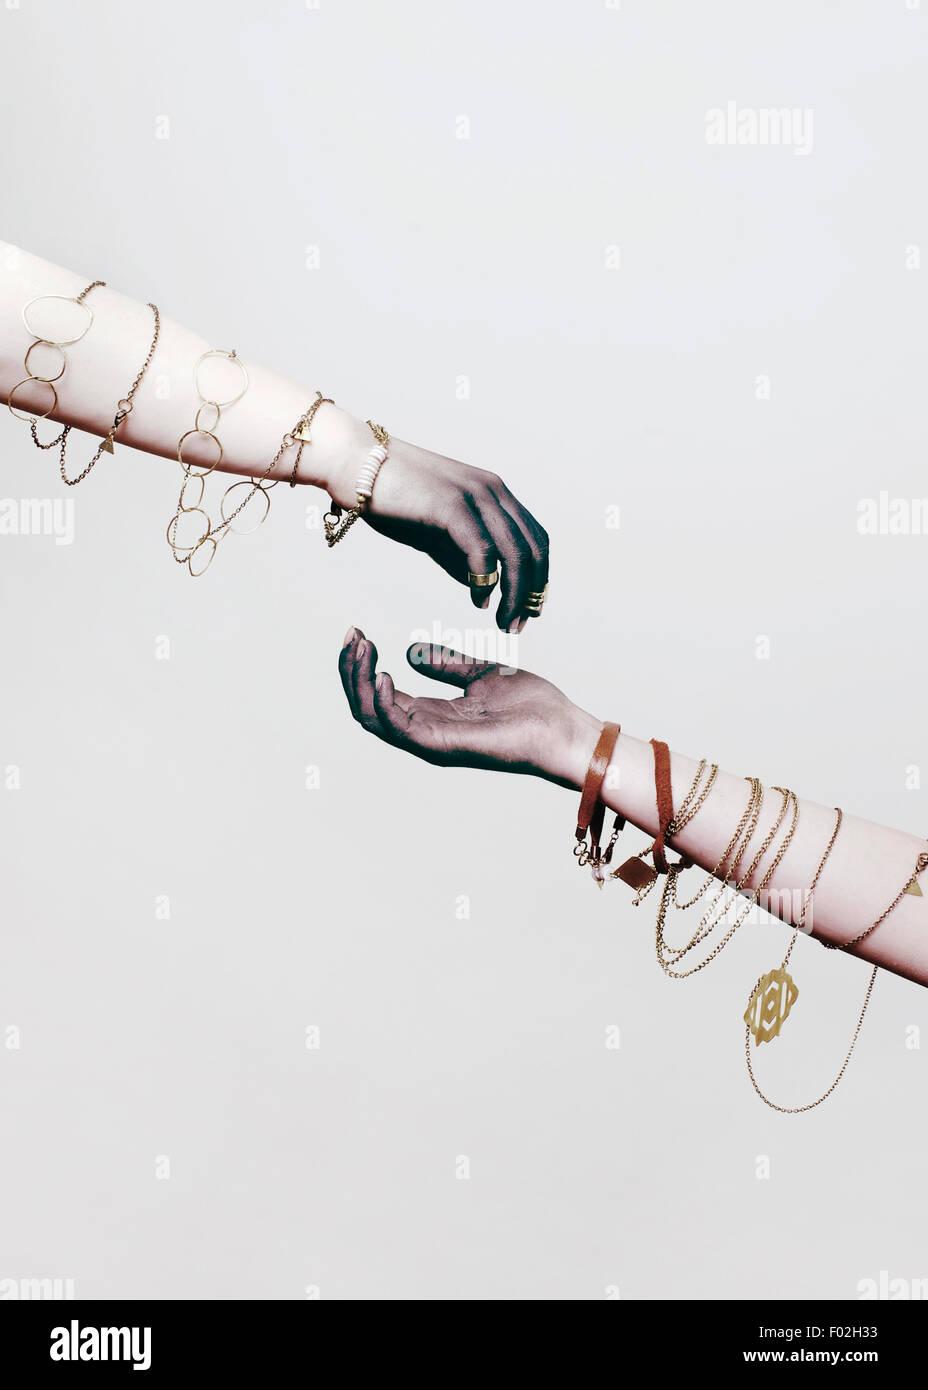 Dos brazos con joyas envuelto alrededor de ellos Imagen De Stock